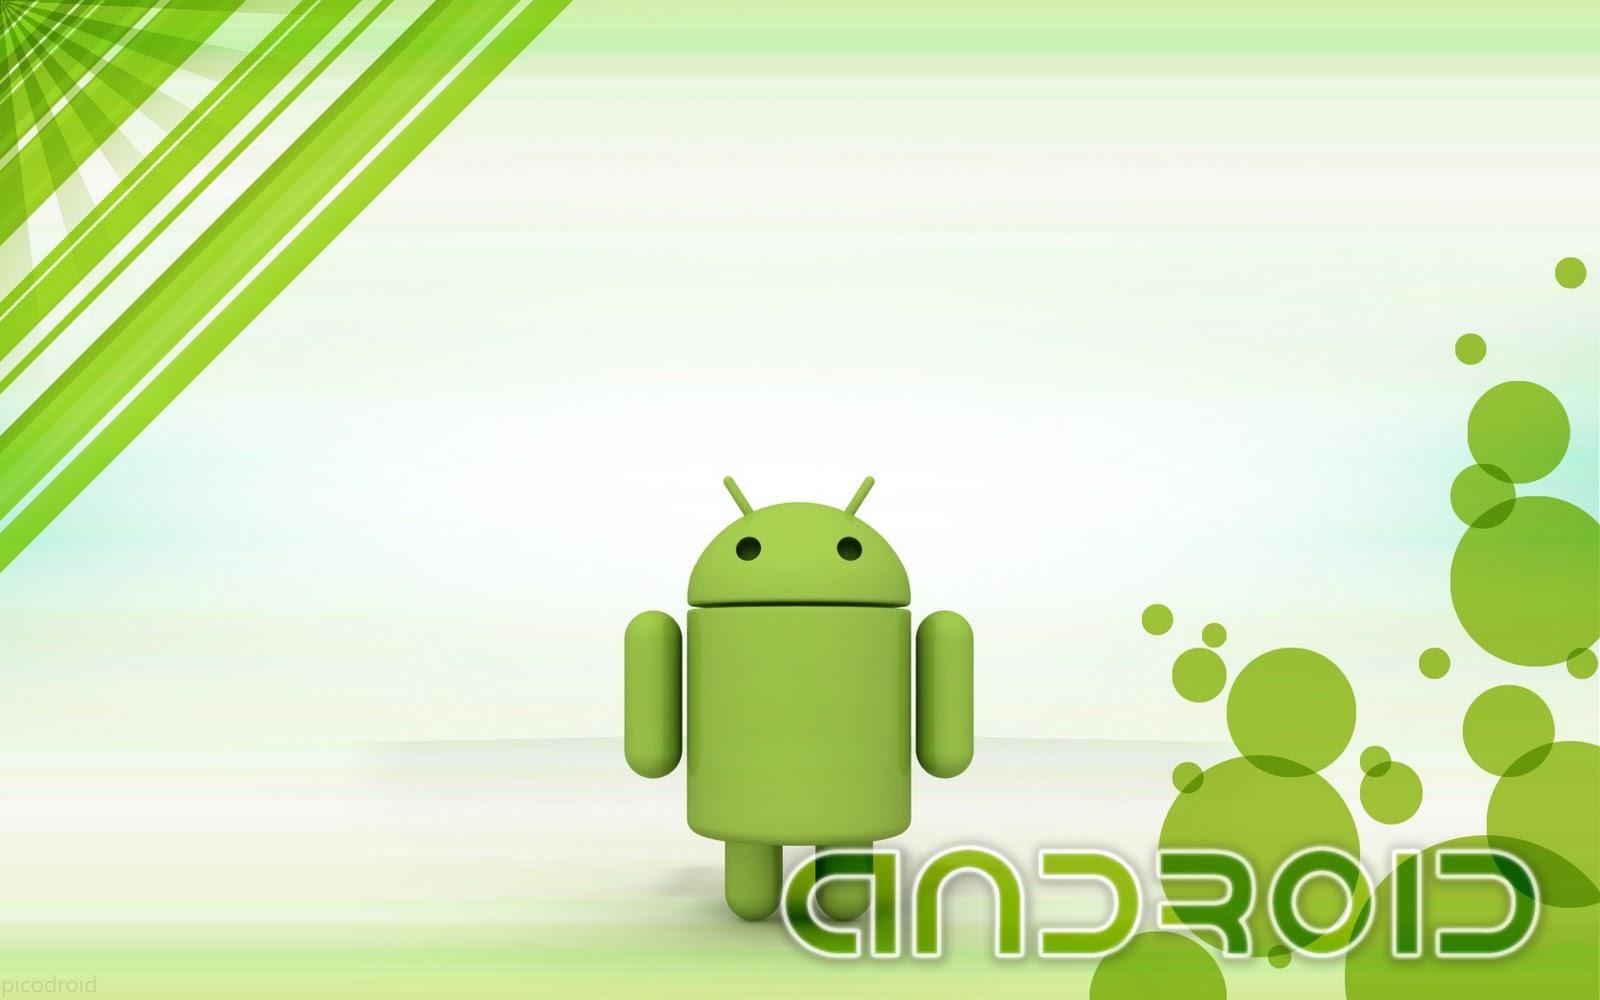 http://4.bp.blogspot.com/-G2sygPW4DG4/Tt6mEEGXA2I/AAAAAAAABrU/gPPOeU2HOLQ/s1600/Android-wallpaper-140android.jpg